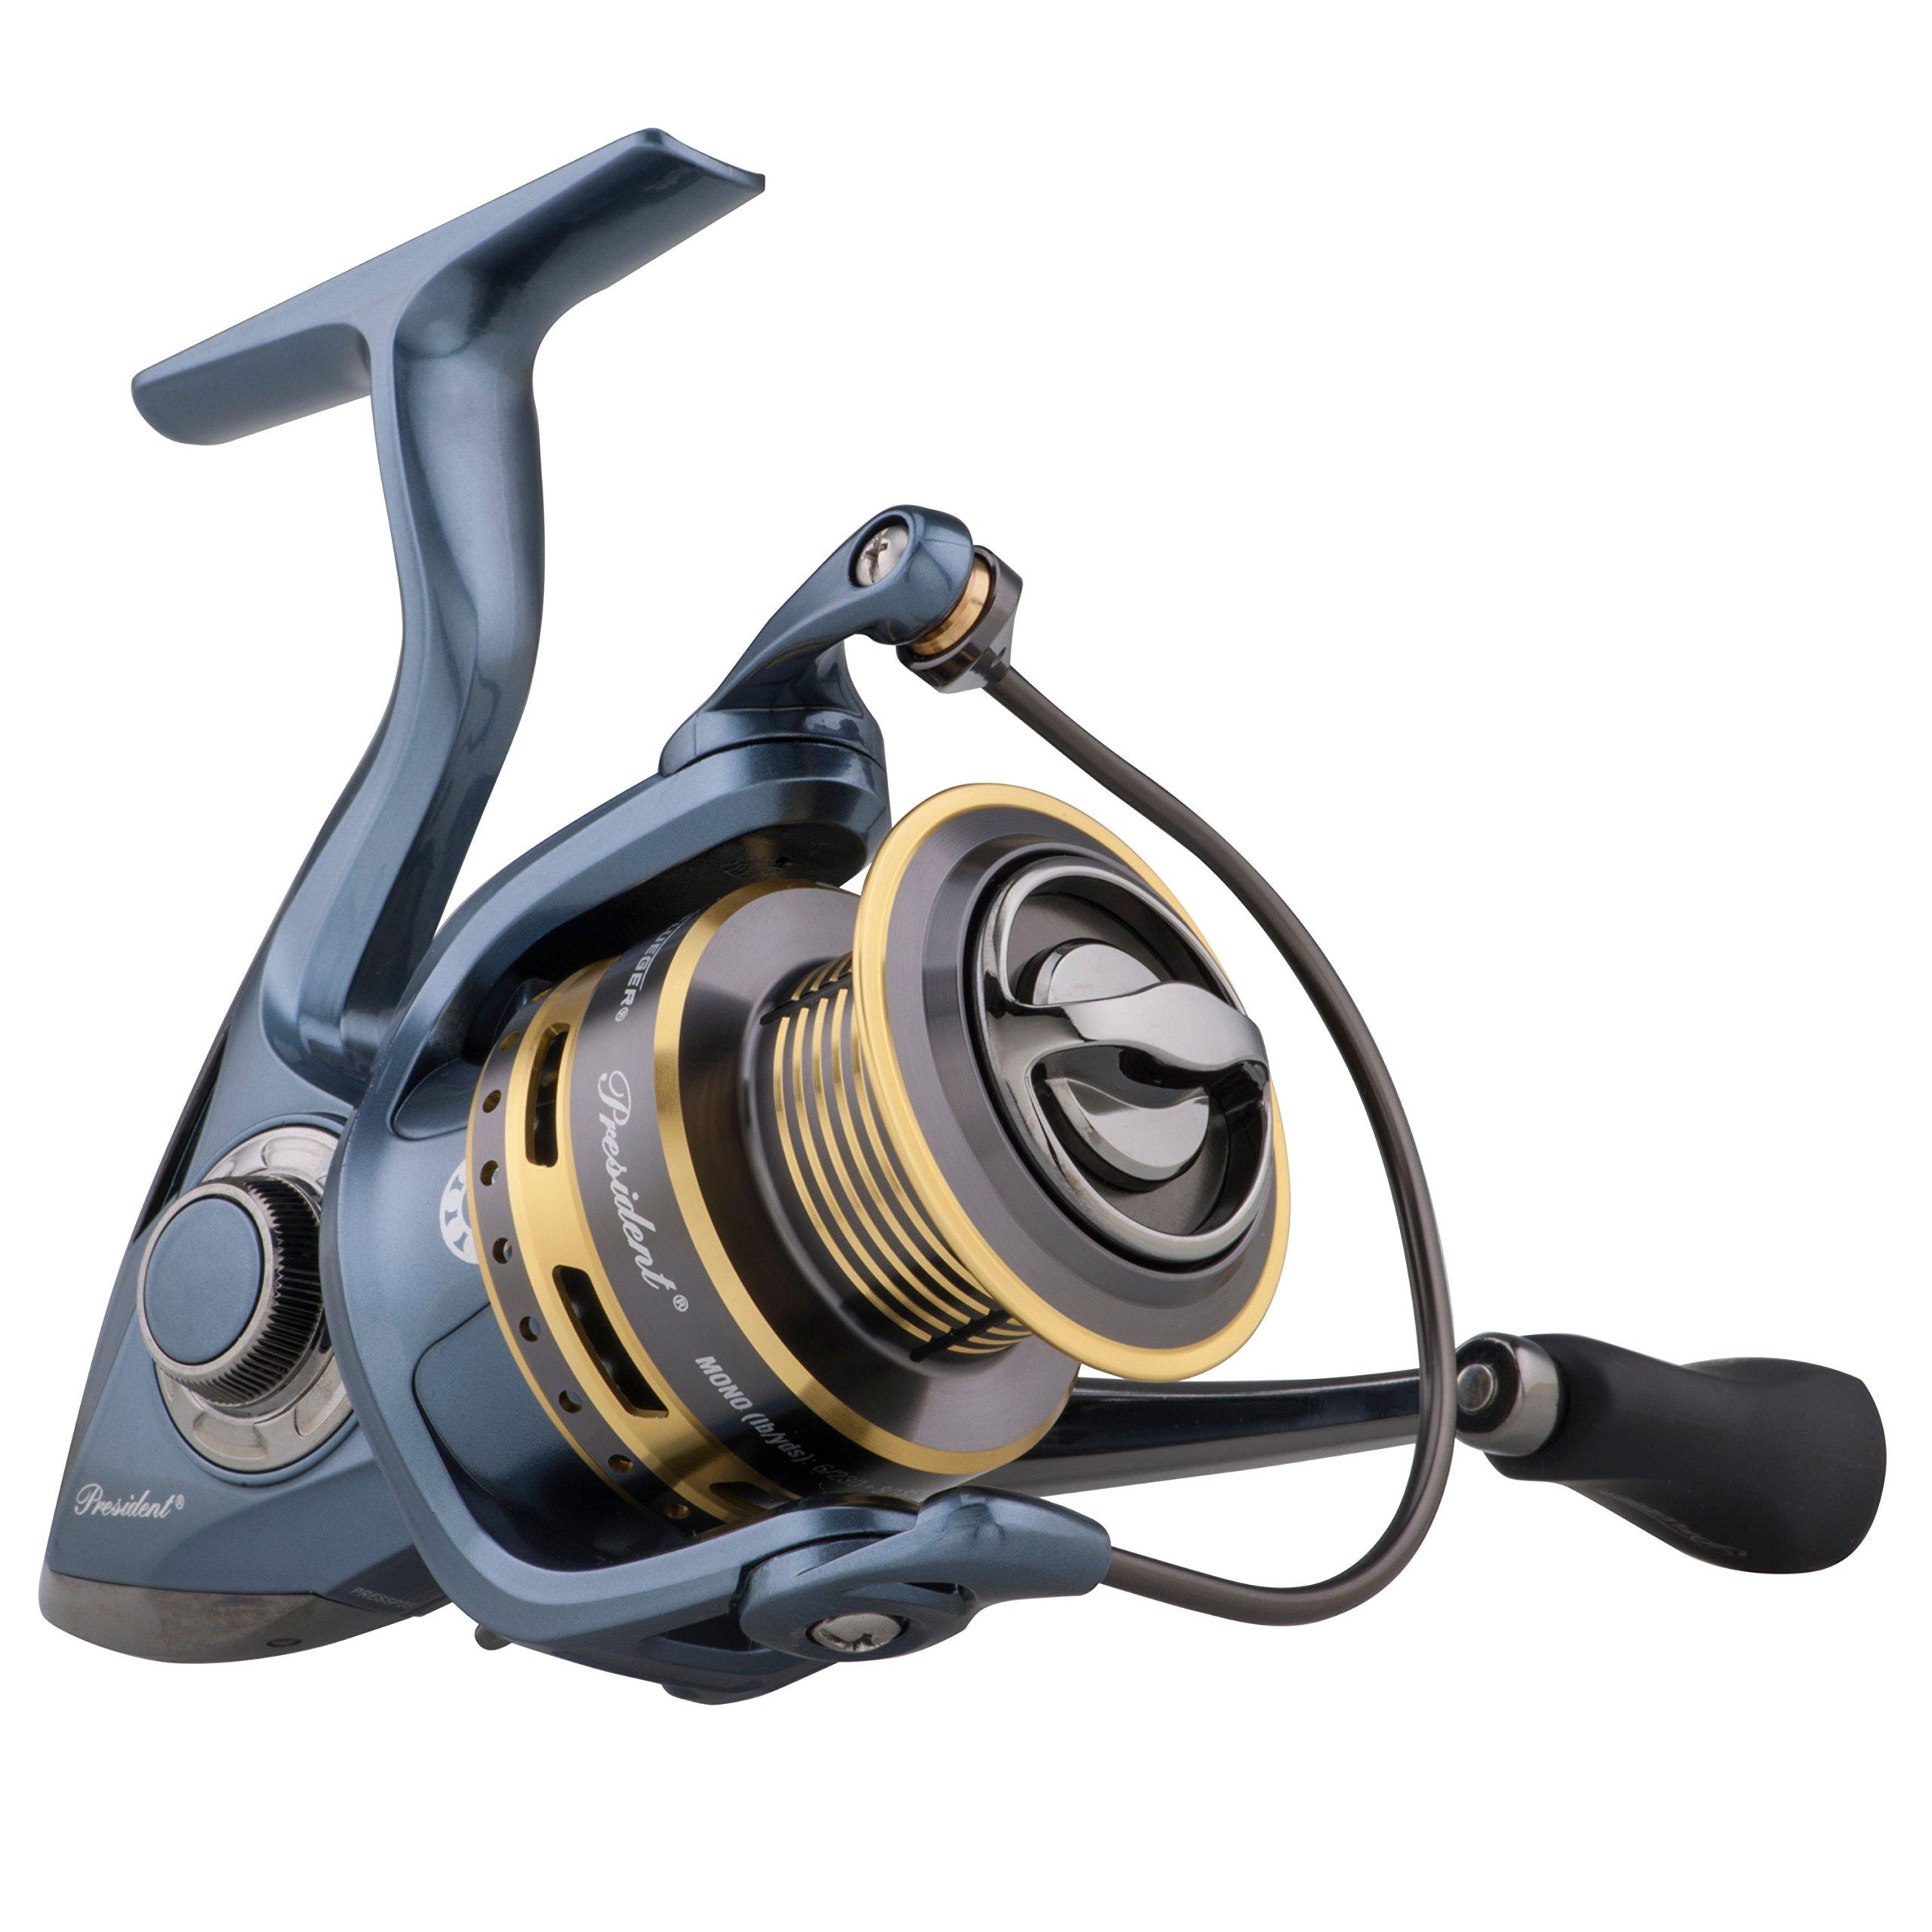 Pflueger PRESSP30X President Spinning Fishing